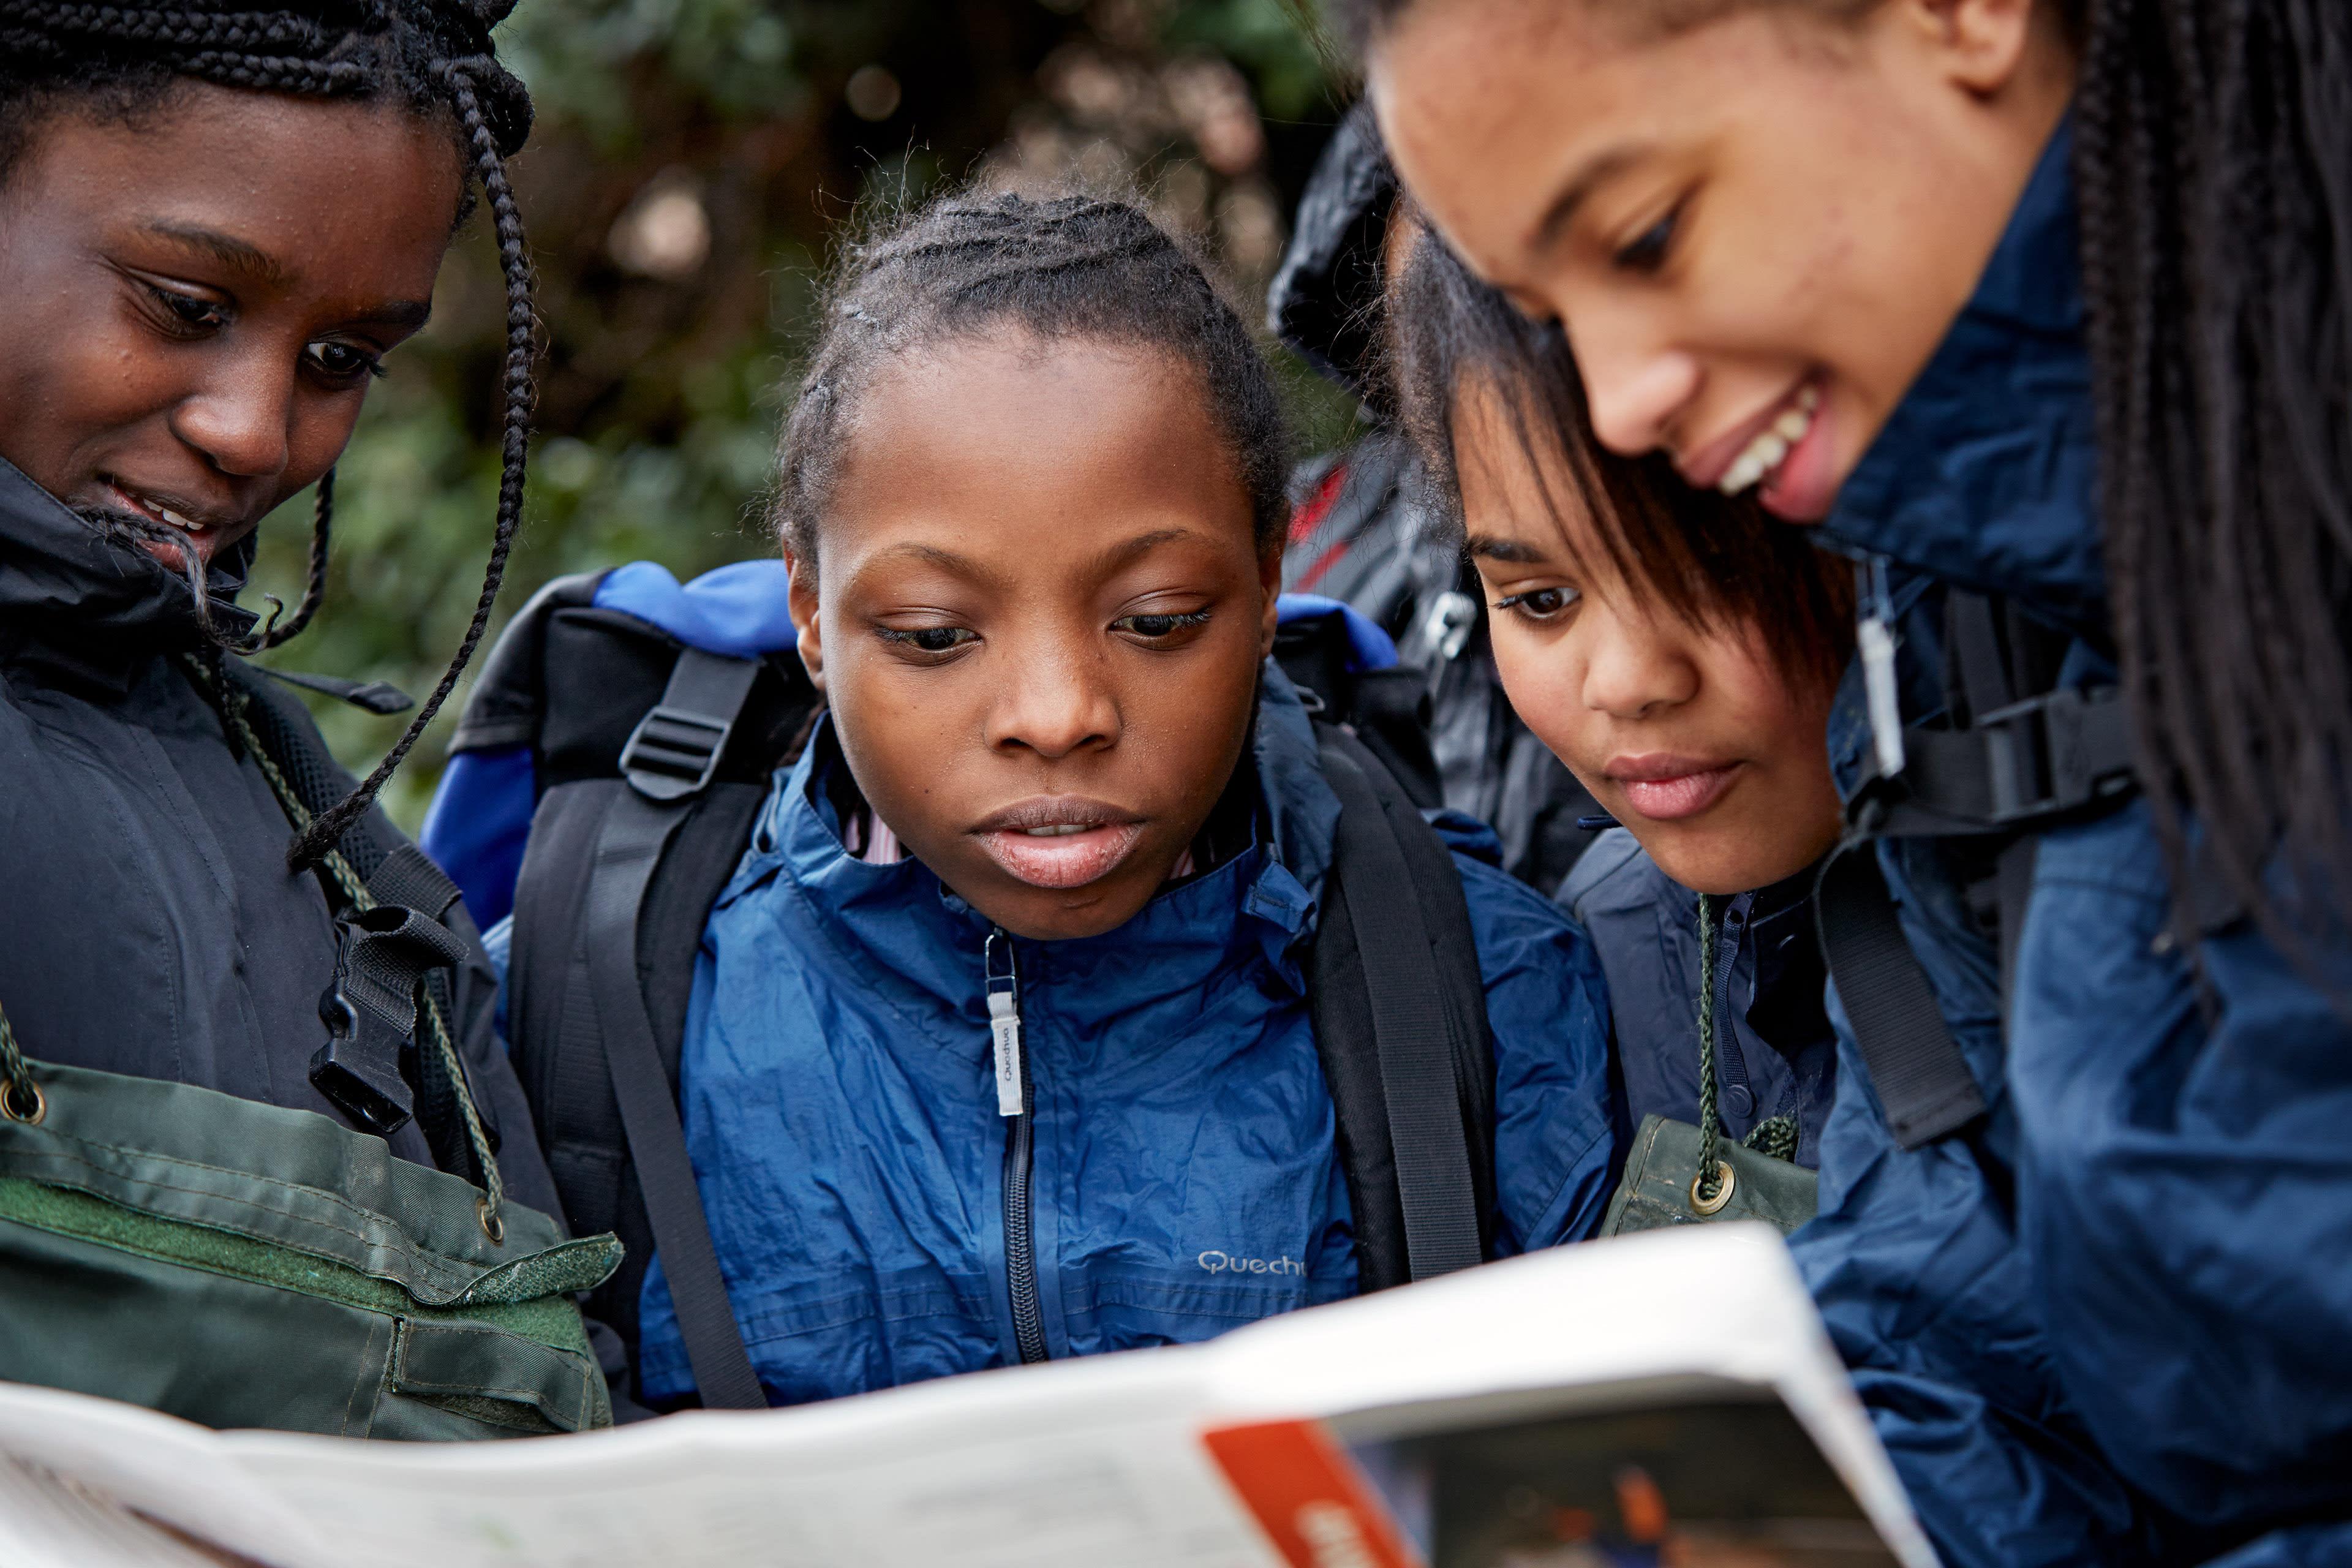 Richard Moran Outwardsboundtrust Education lifestyle kids 019